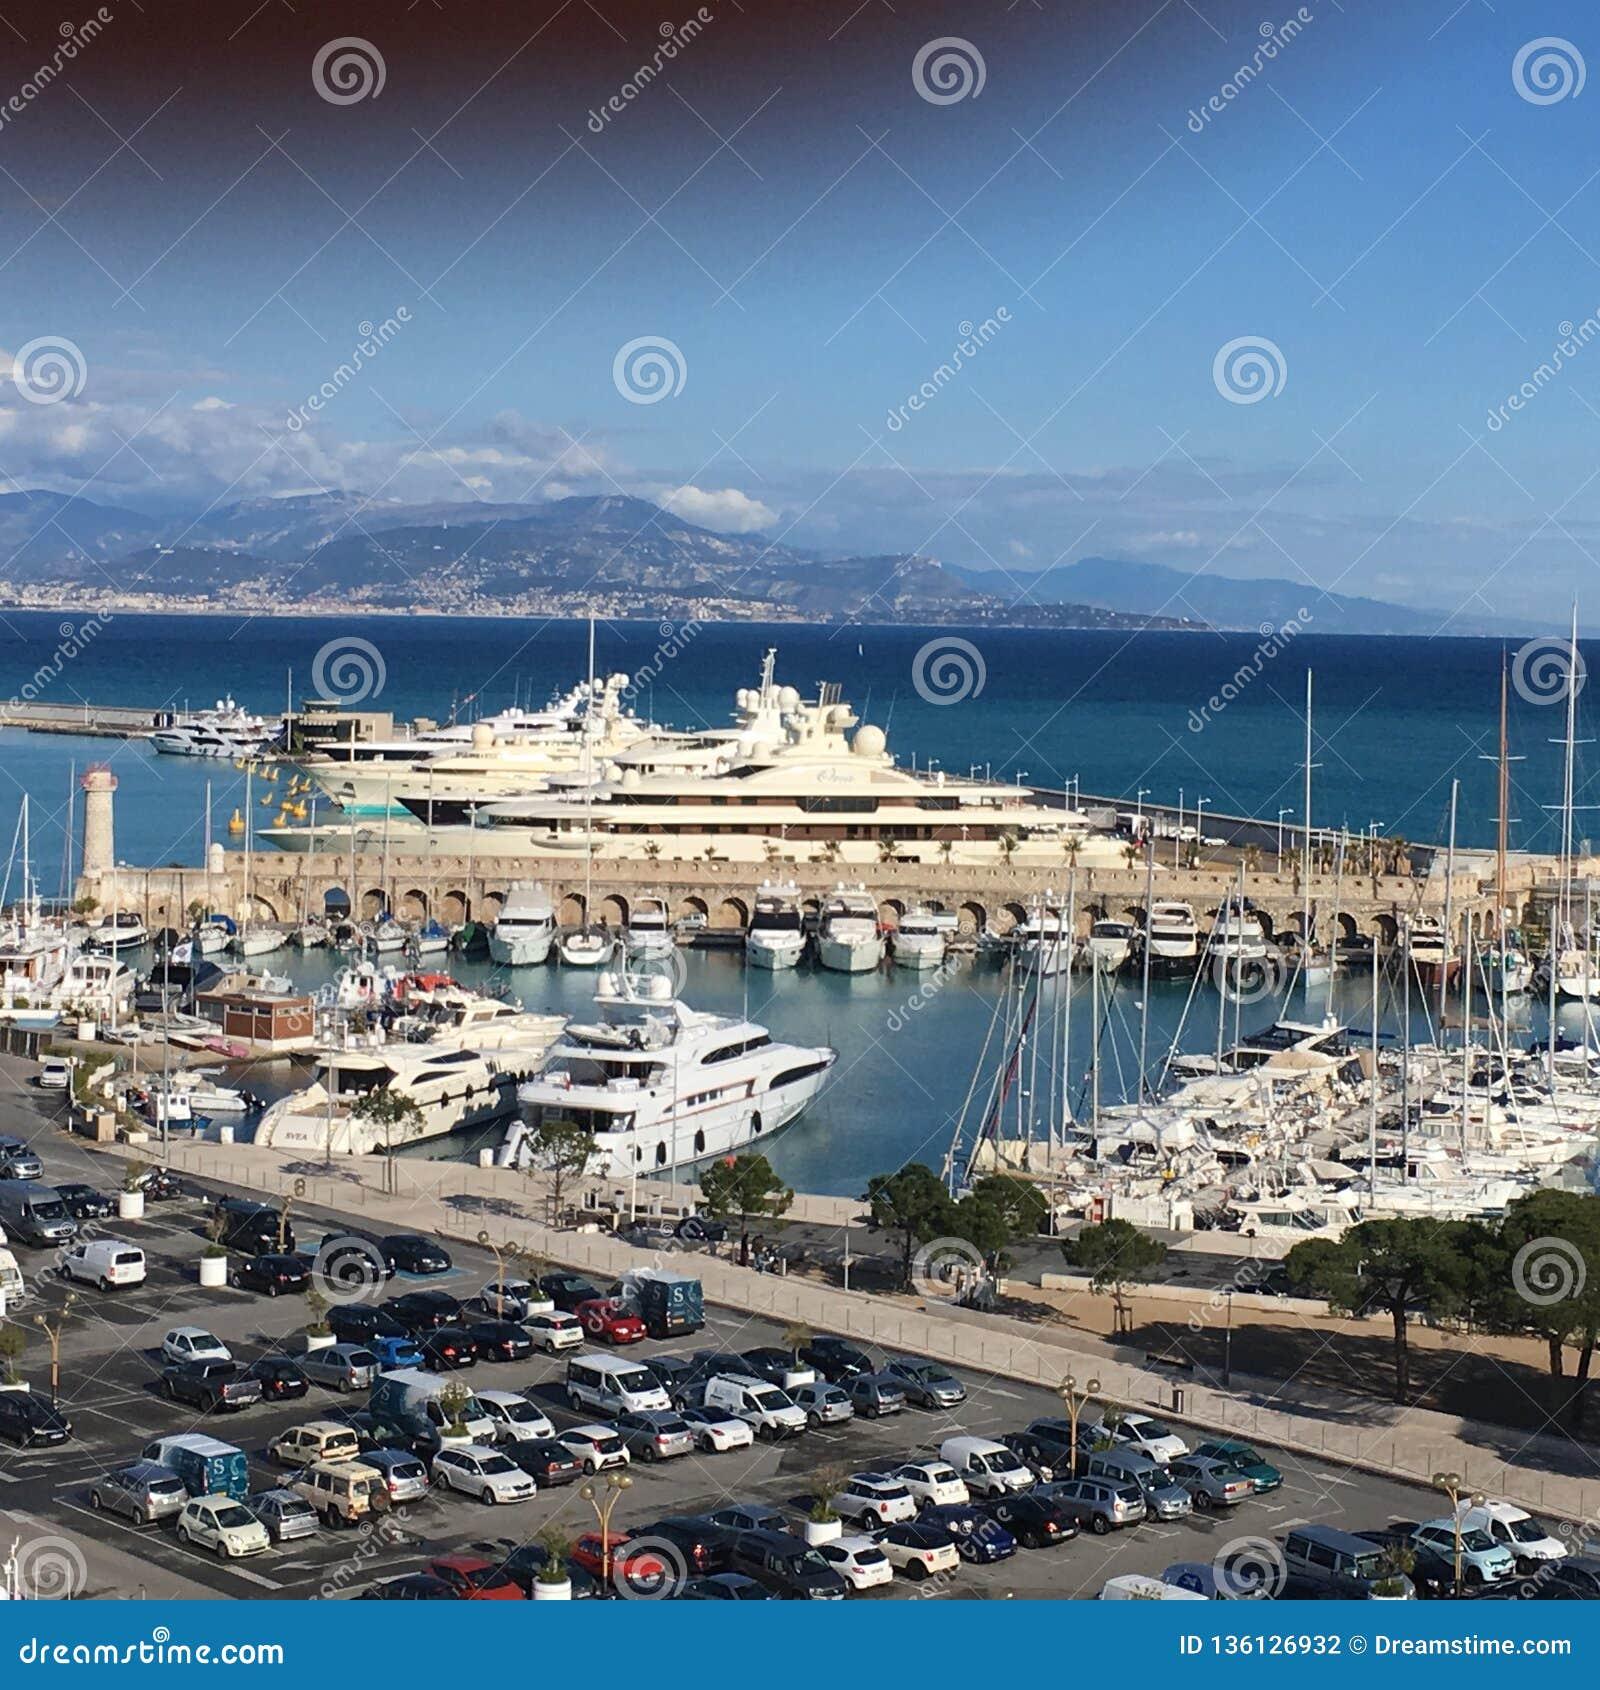 Les millionnaires rament, Antibes, France